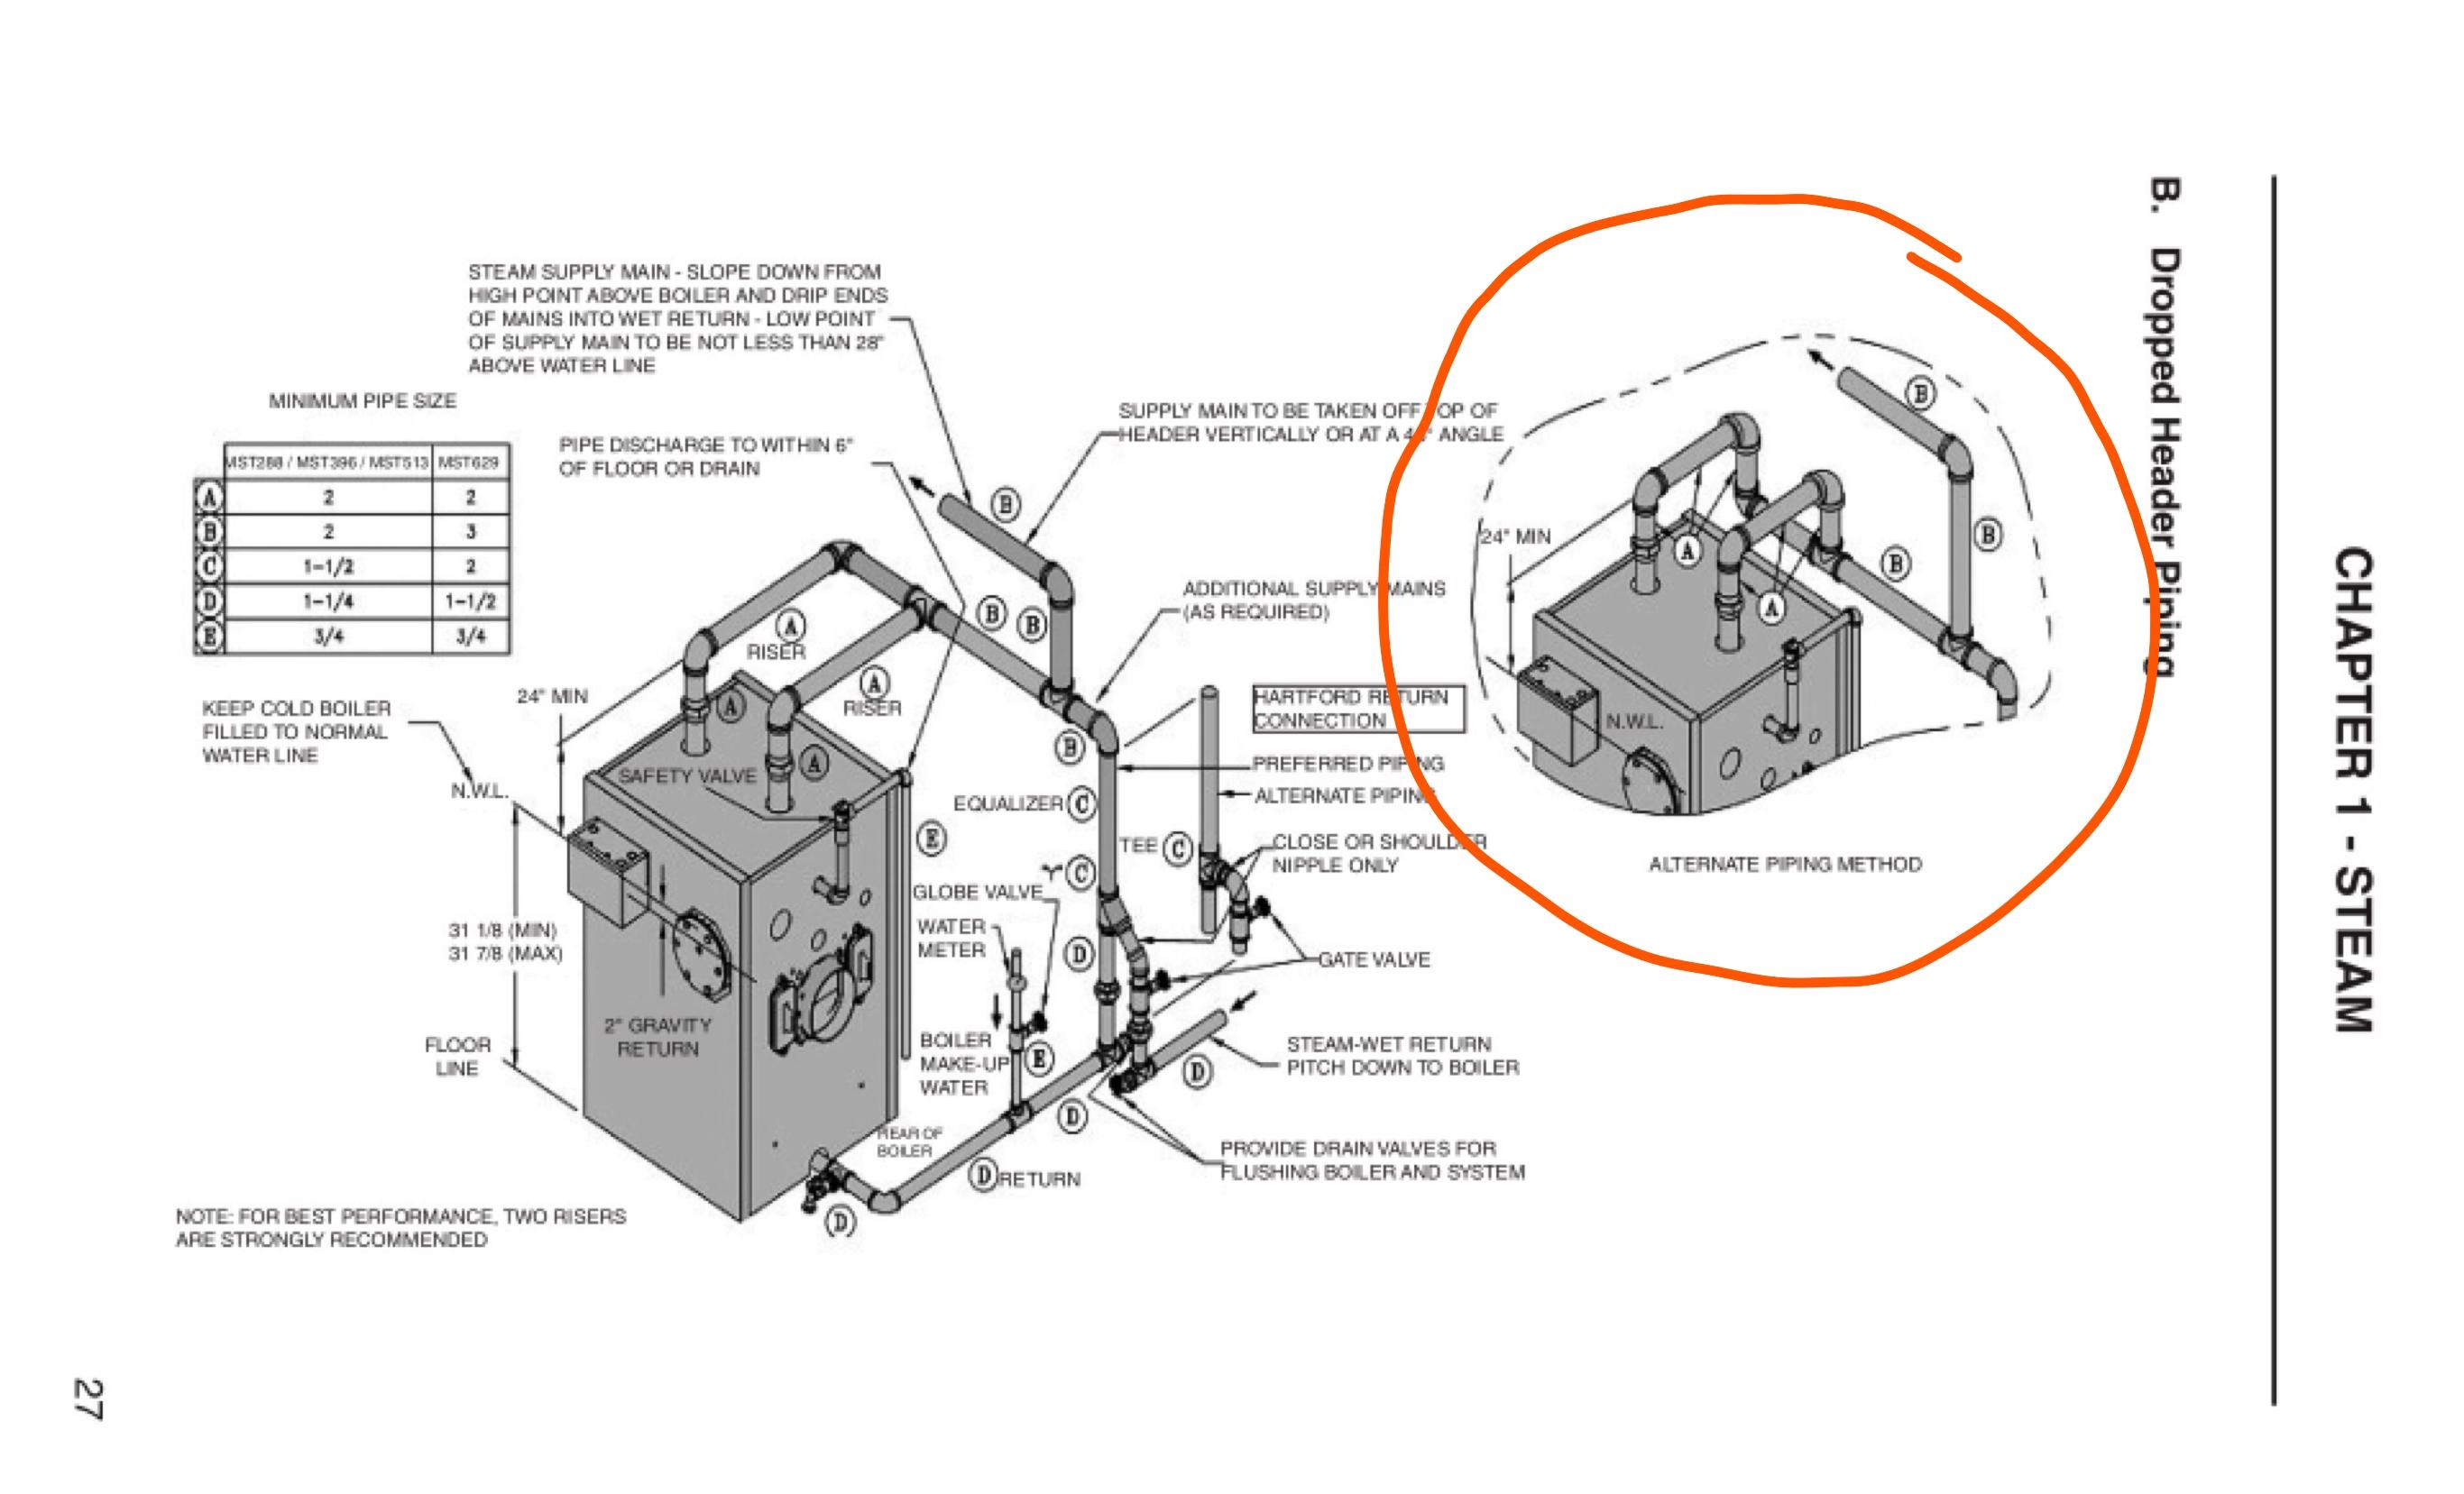 Vxt Water Feeder Wiring Diagram : 31 Wiring Diagram Images